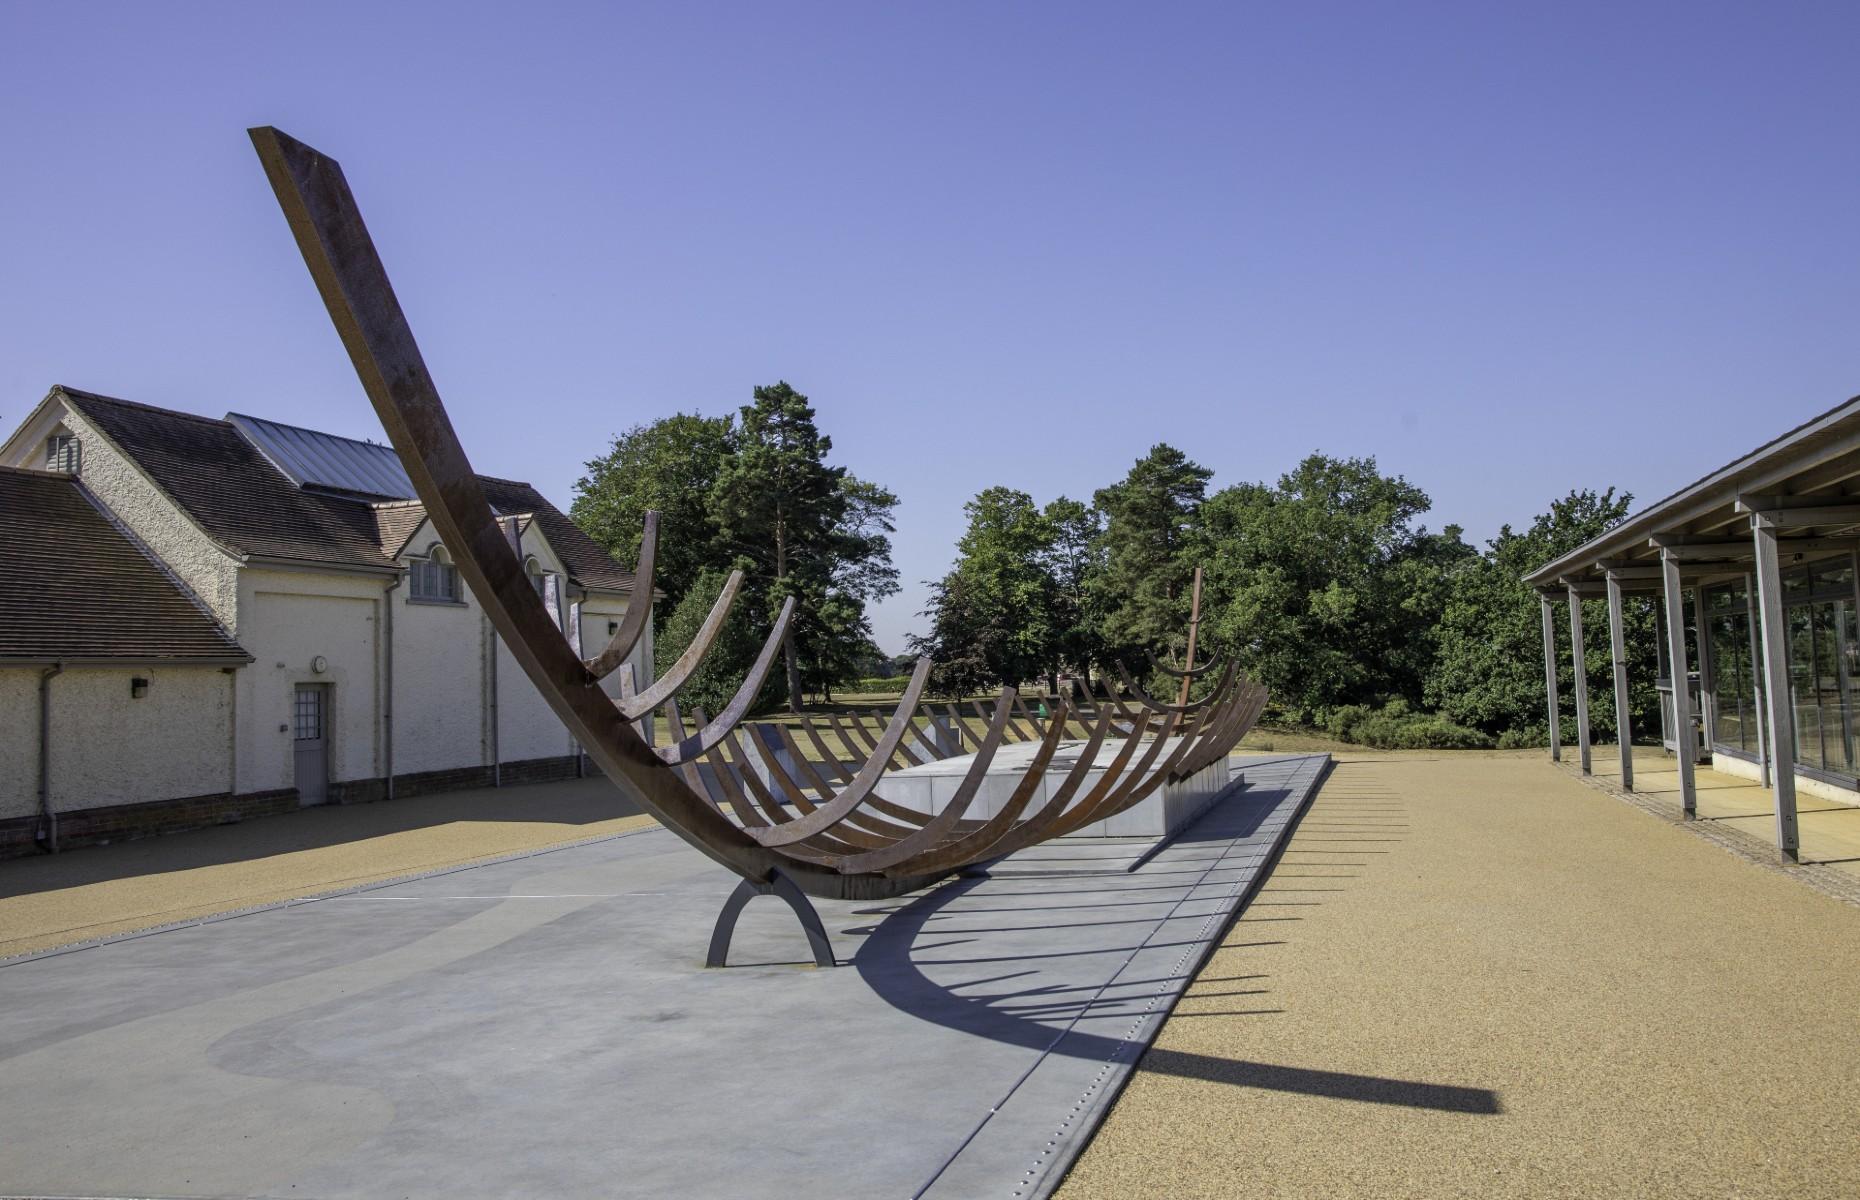 Longboat replica at Sutton Hoo (Image: Wirestock Creations/Shutterstock)